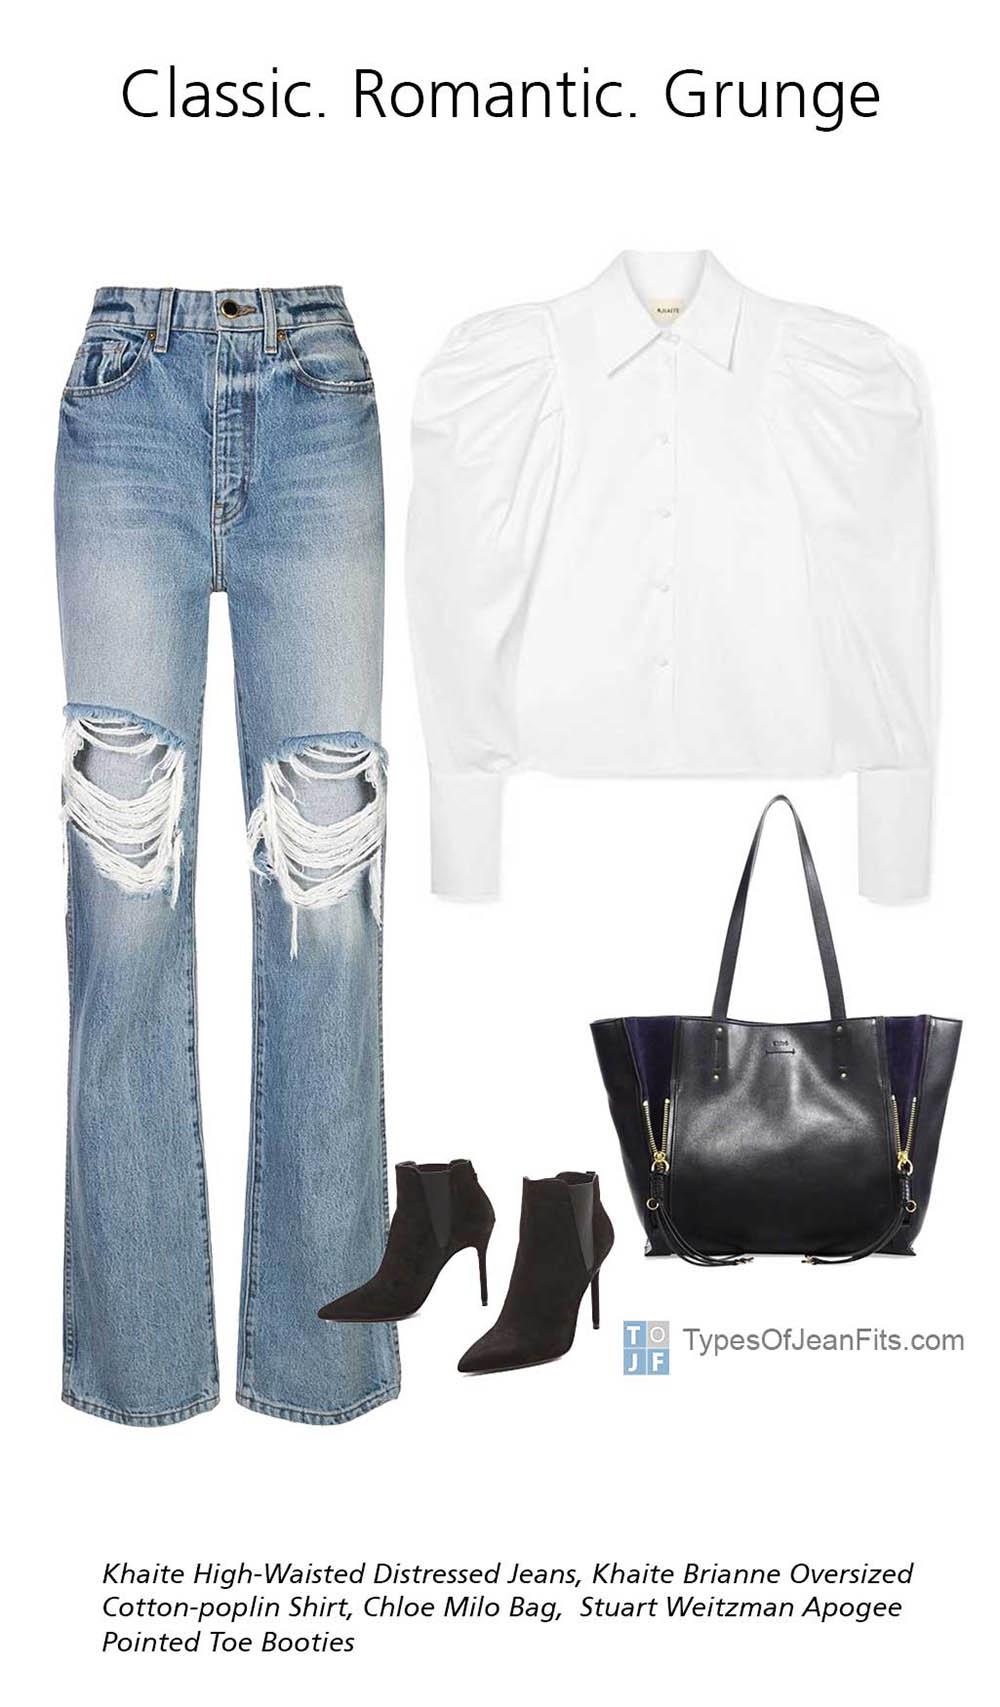 Khaite Brianne Oversized Cotton-poplin Shirt, Khaite High-Waisted Distressed Jeans, Stuart Weitzman Black Apogee Pointed Toe Booties, Black Chloe Milo Bag, Ripped Jeans